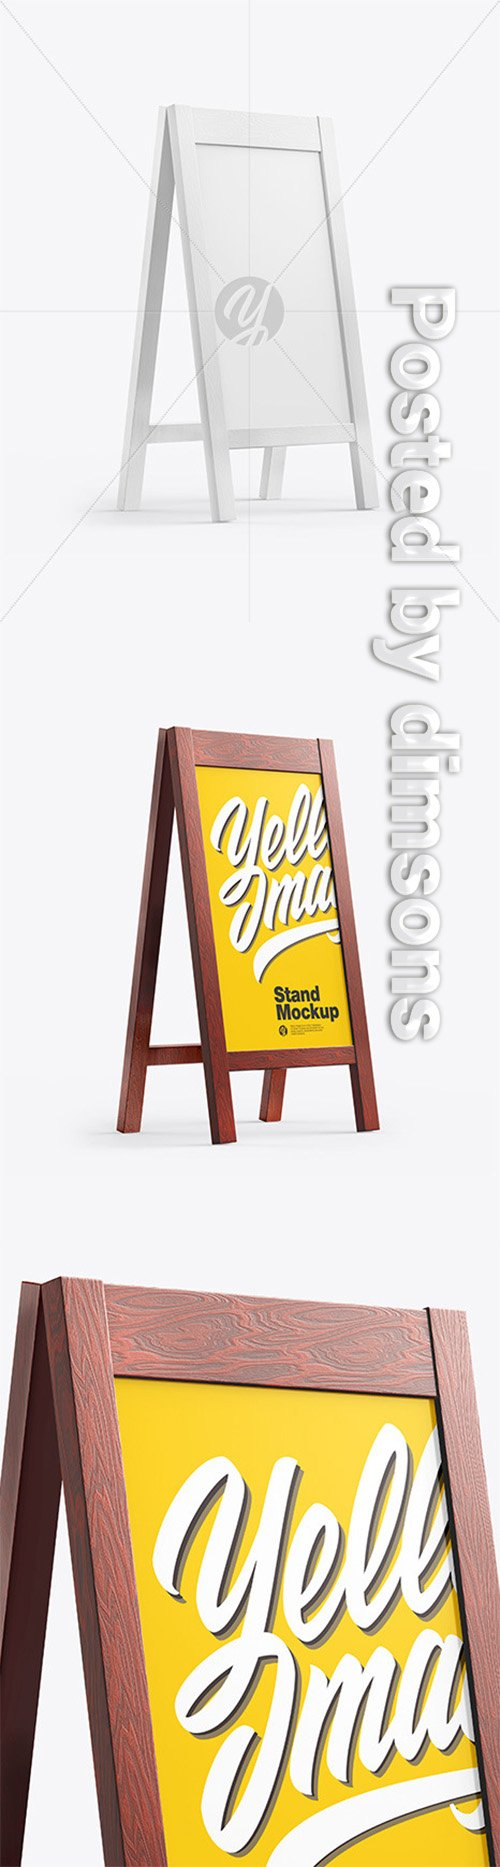 Wooden Street Stand Mockup 65022 TIF